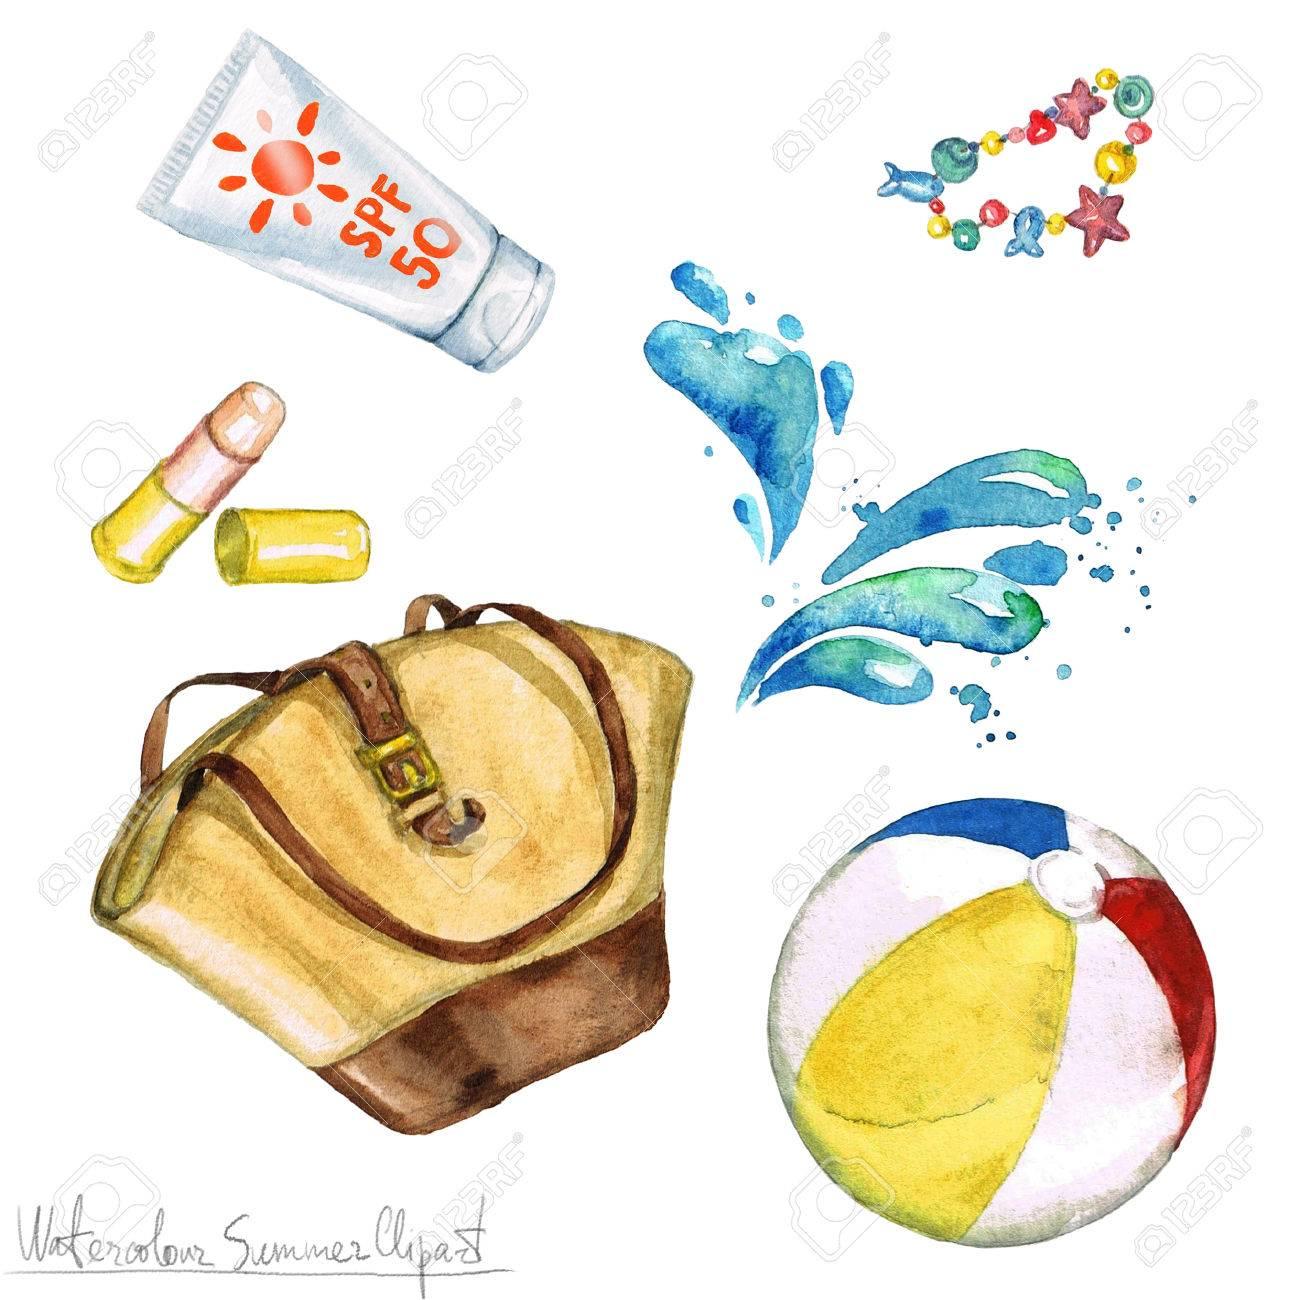 hight resolution of watercolor summer clipart bag sunscreen beach ball stock photo 56638801